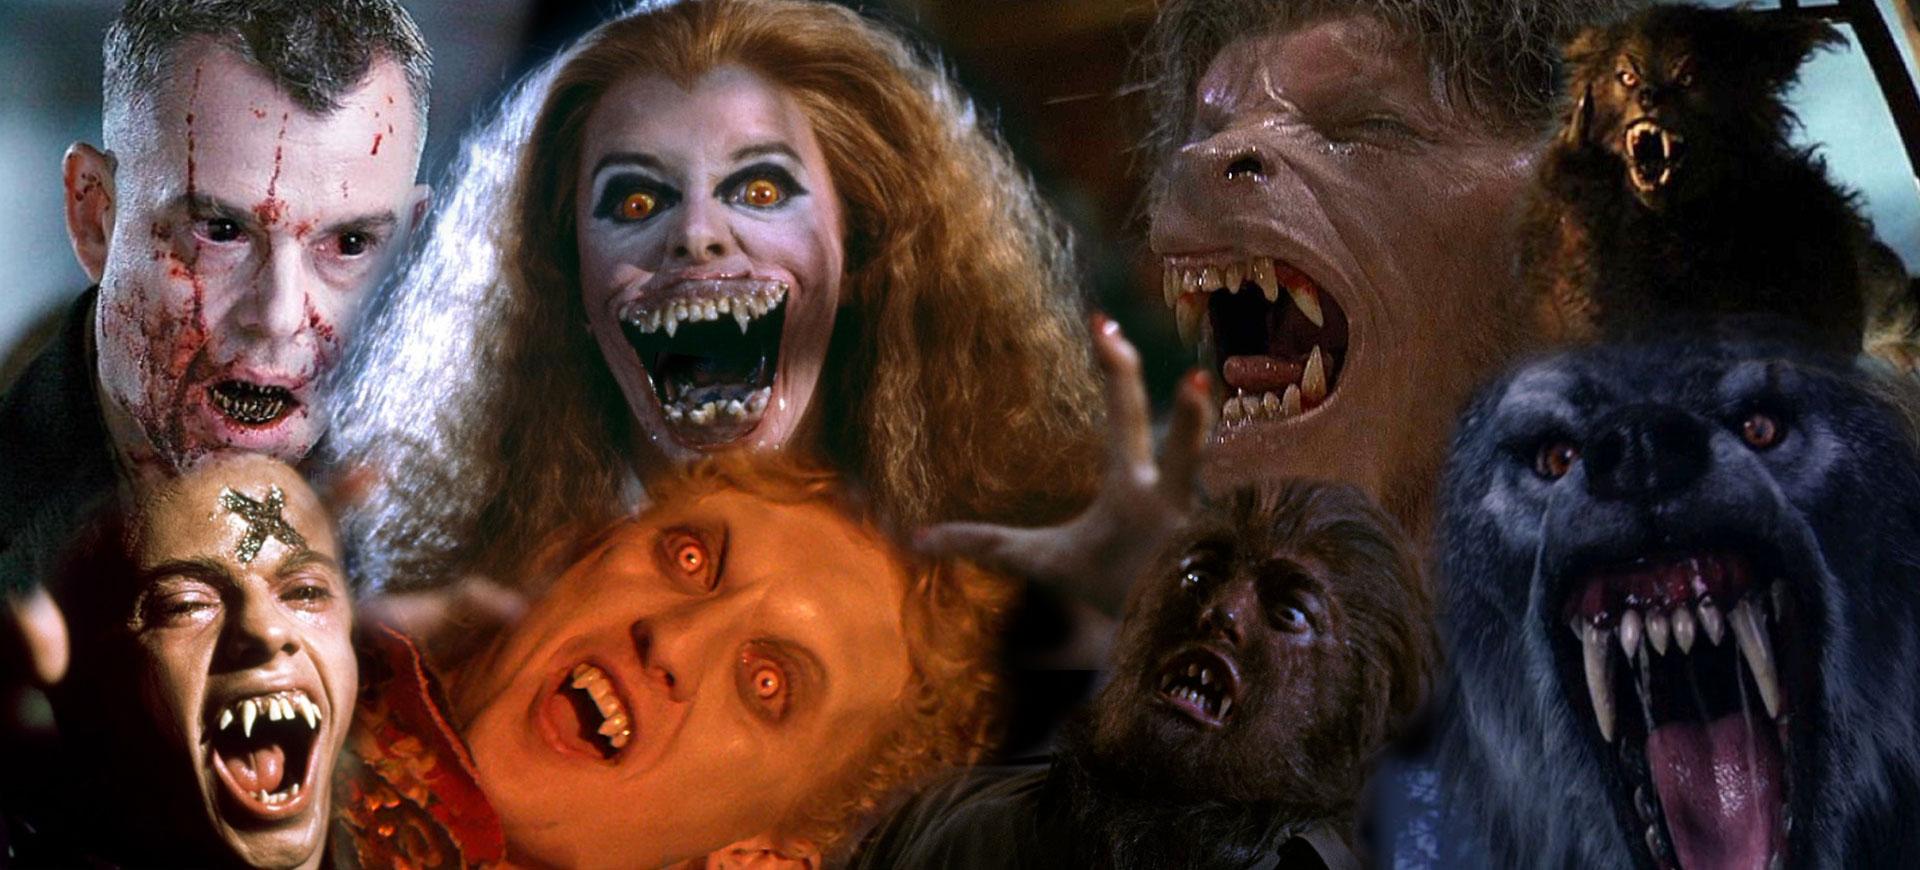 Home - Horror Land Zombie Vs Vampire Vs Werewolf